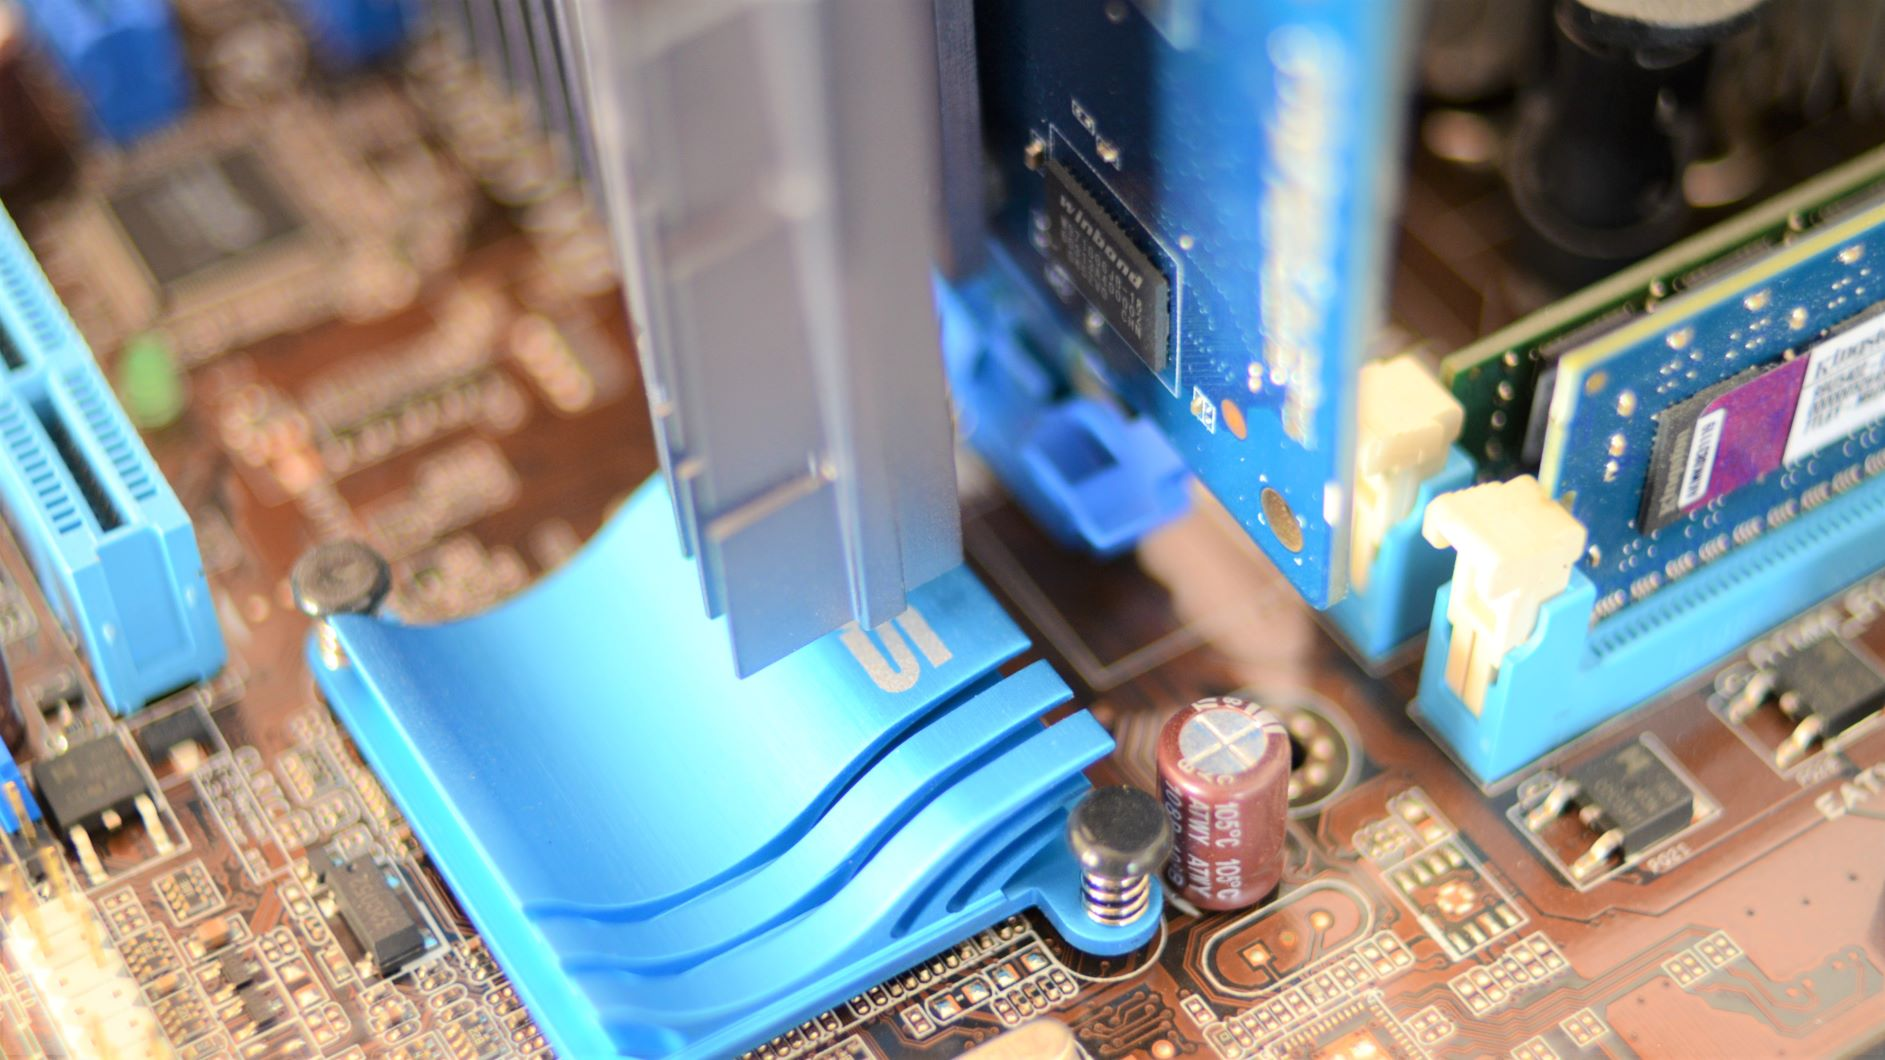 Computer Laptop Repairs Maldon Essex